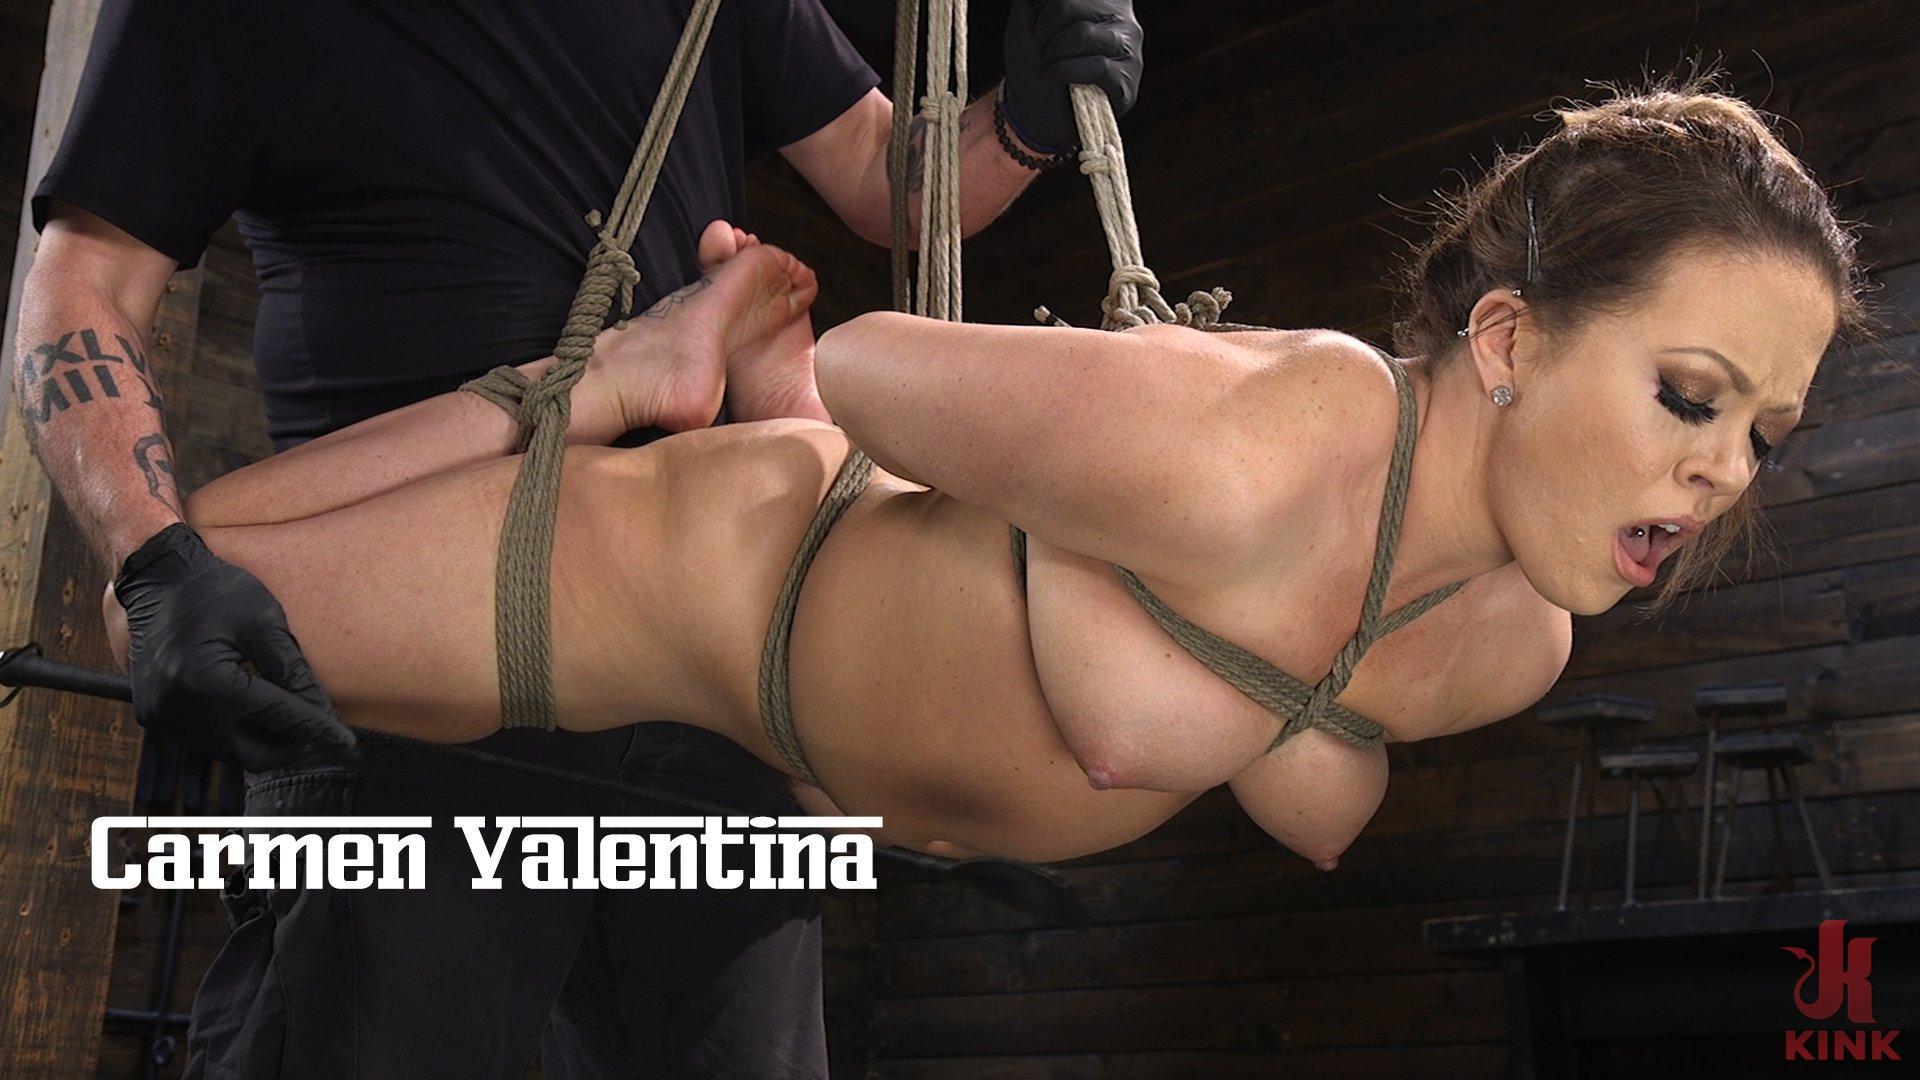 Carmen Valentina: The Brutal Bondage Basics!